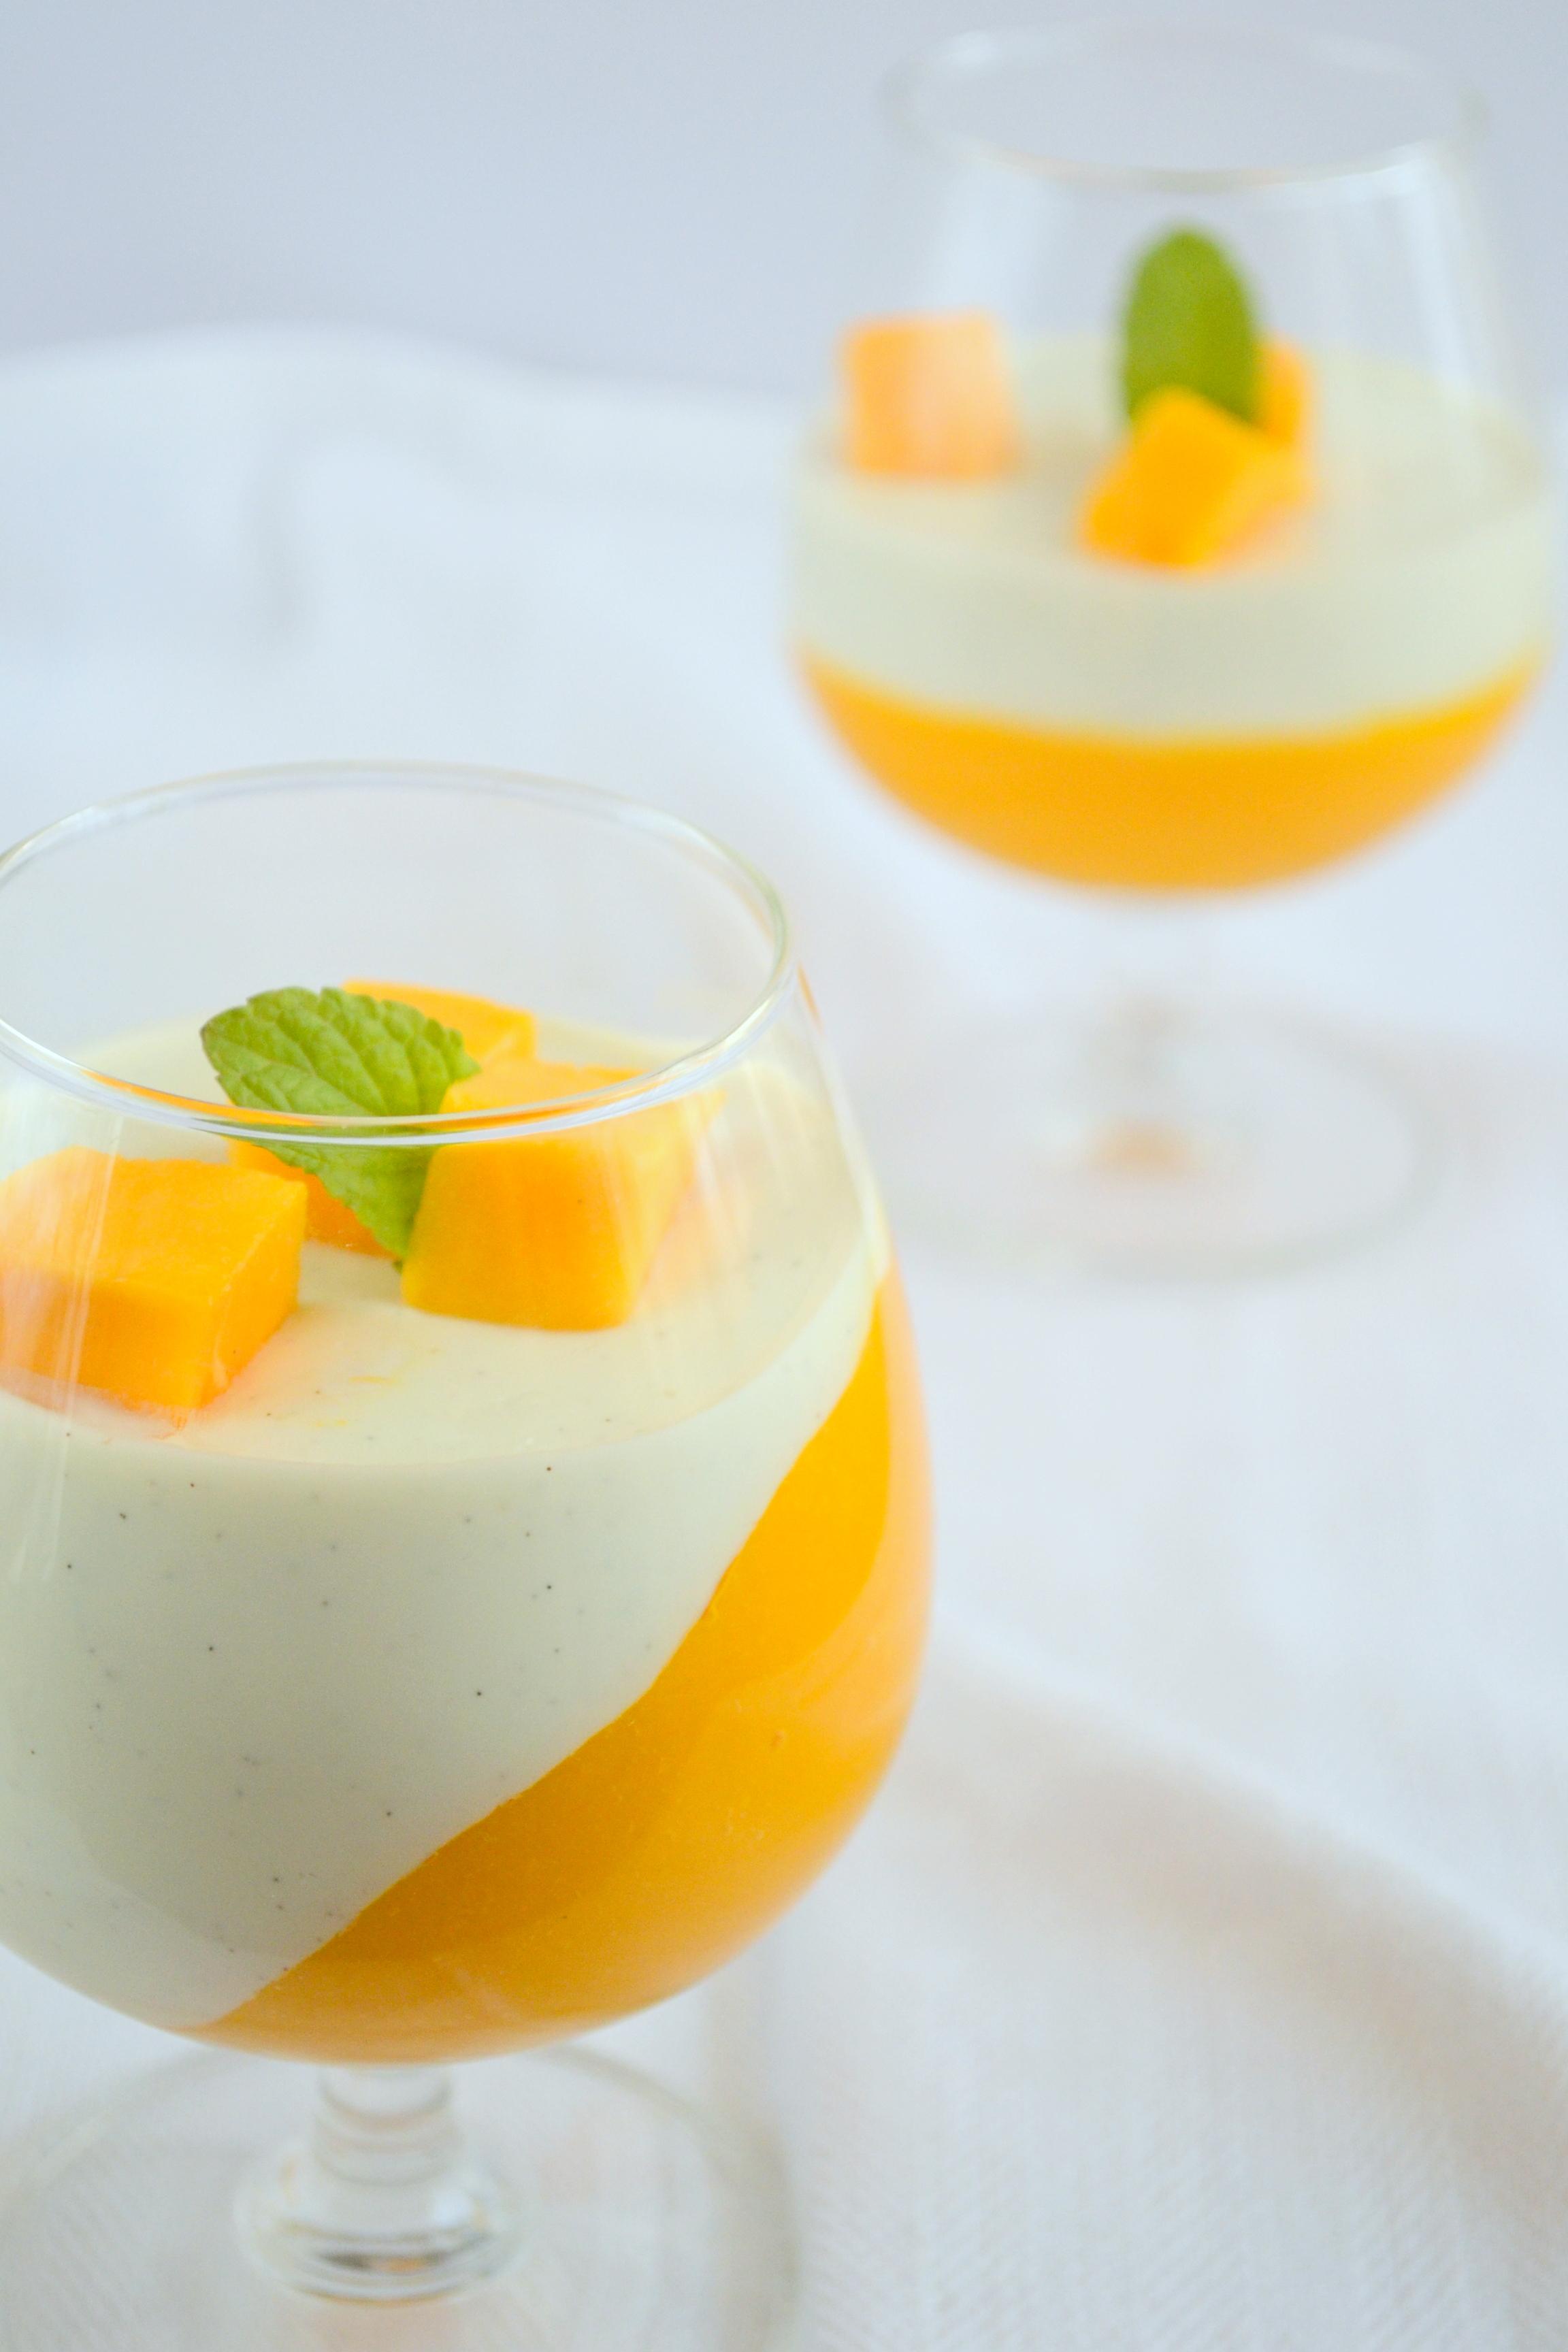 Vanilla Bean Panna Cotta With Mango Coulis - The White Ramekins